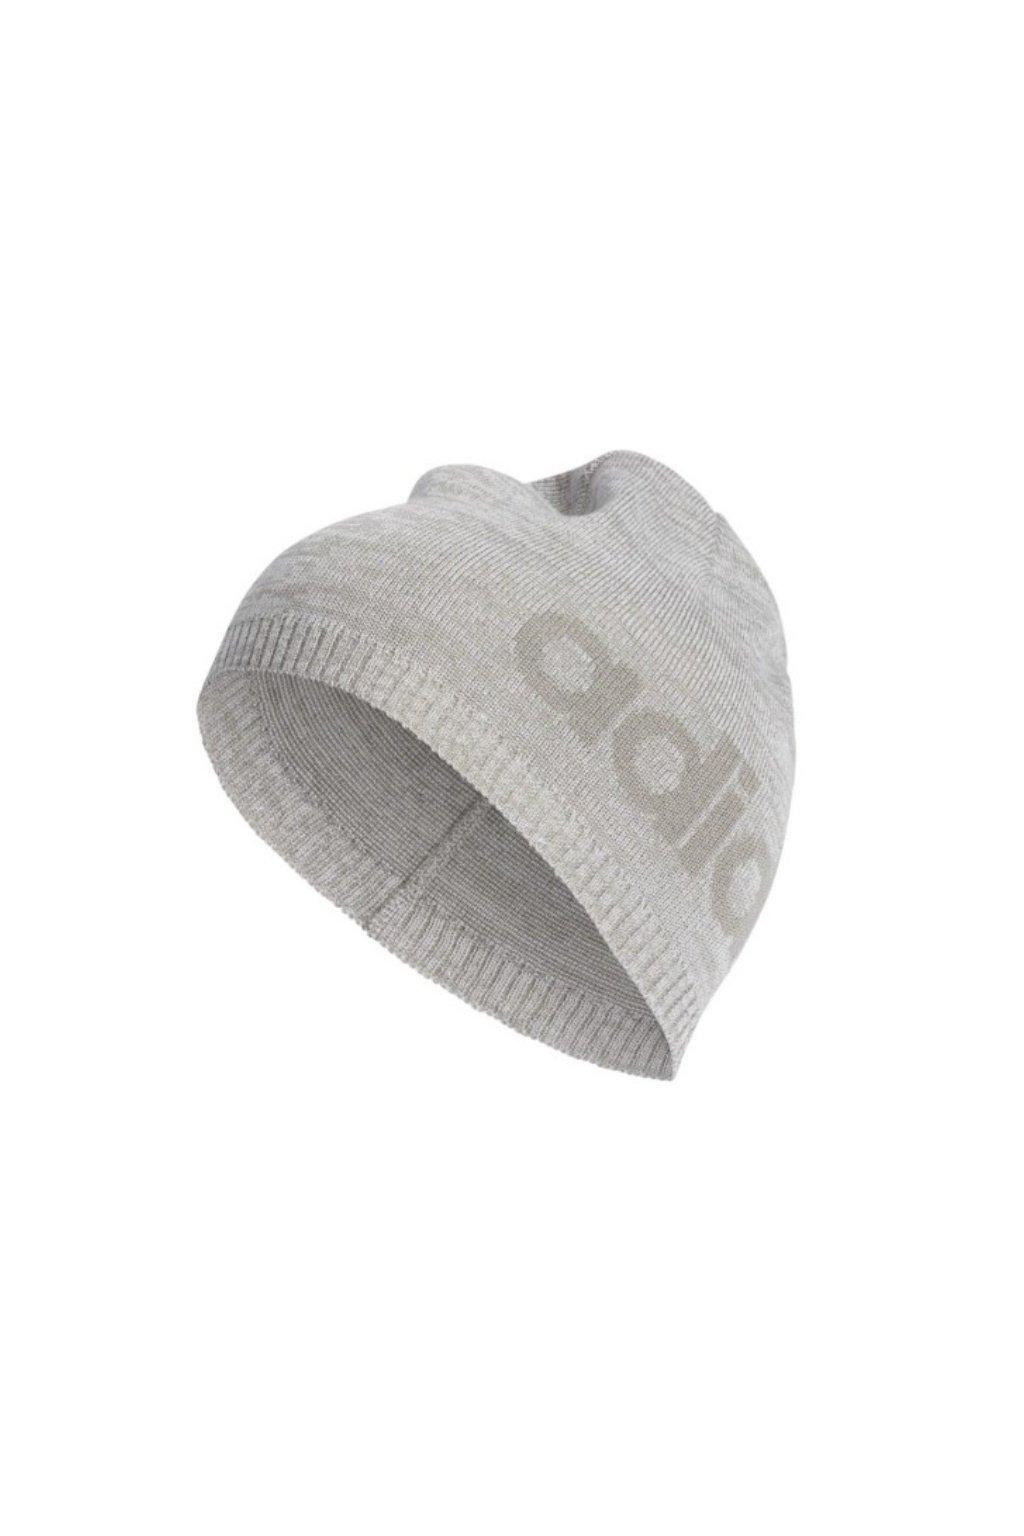 b21cc96cd Pánska čiapka Adidas CY5611 - Fresh sport